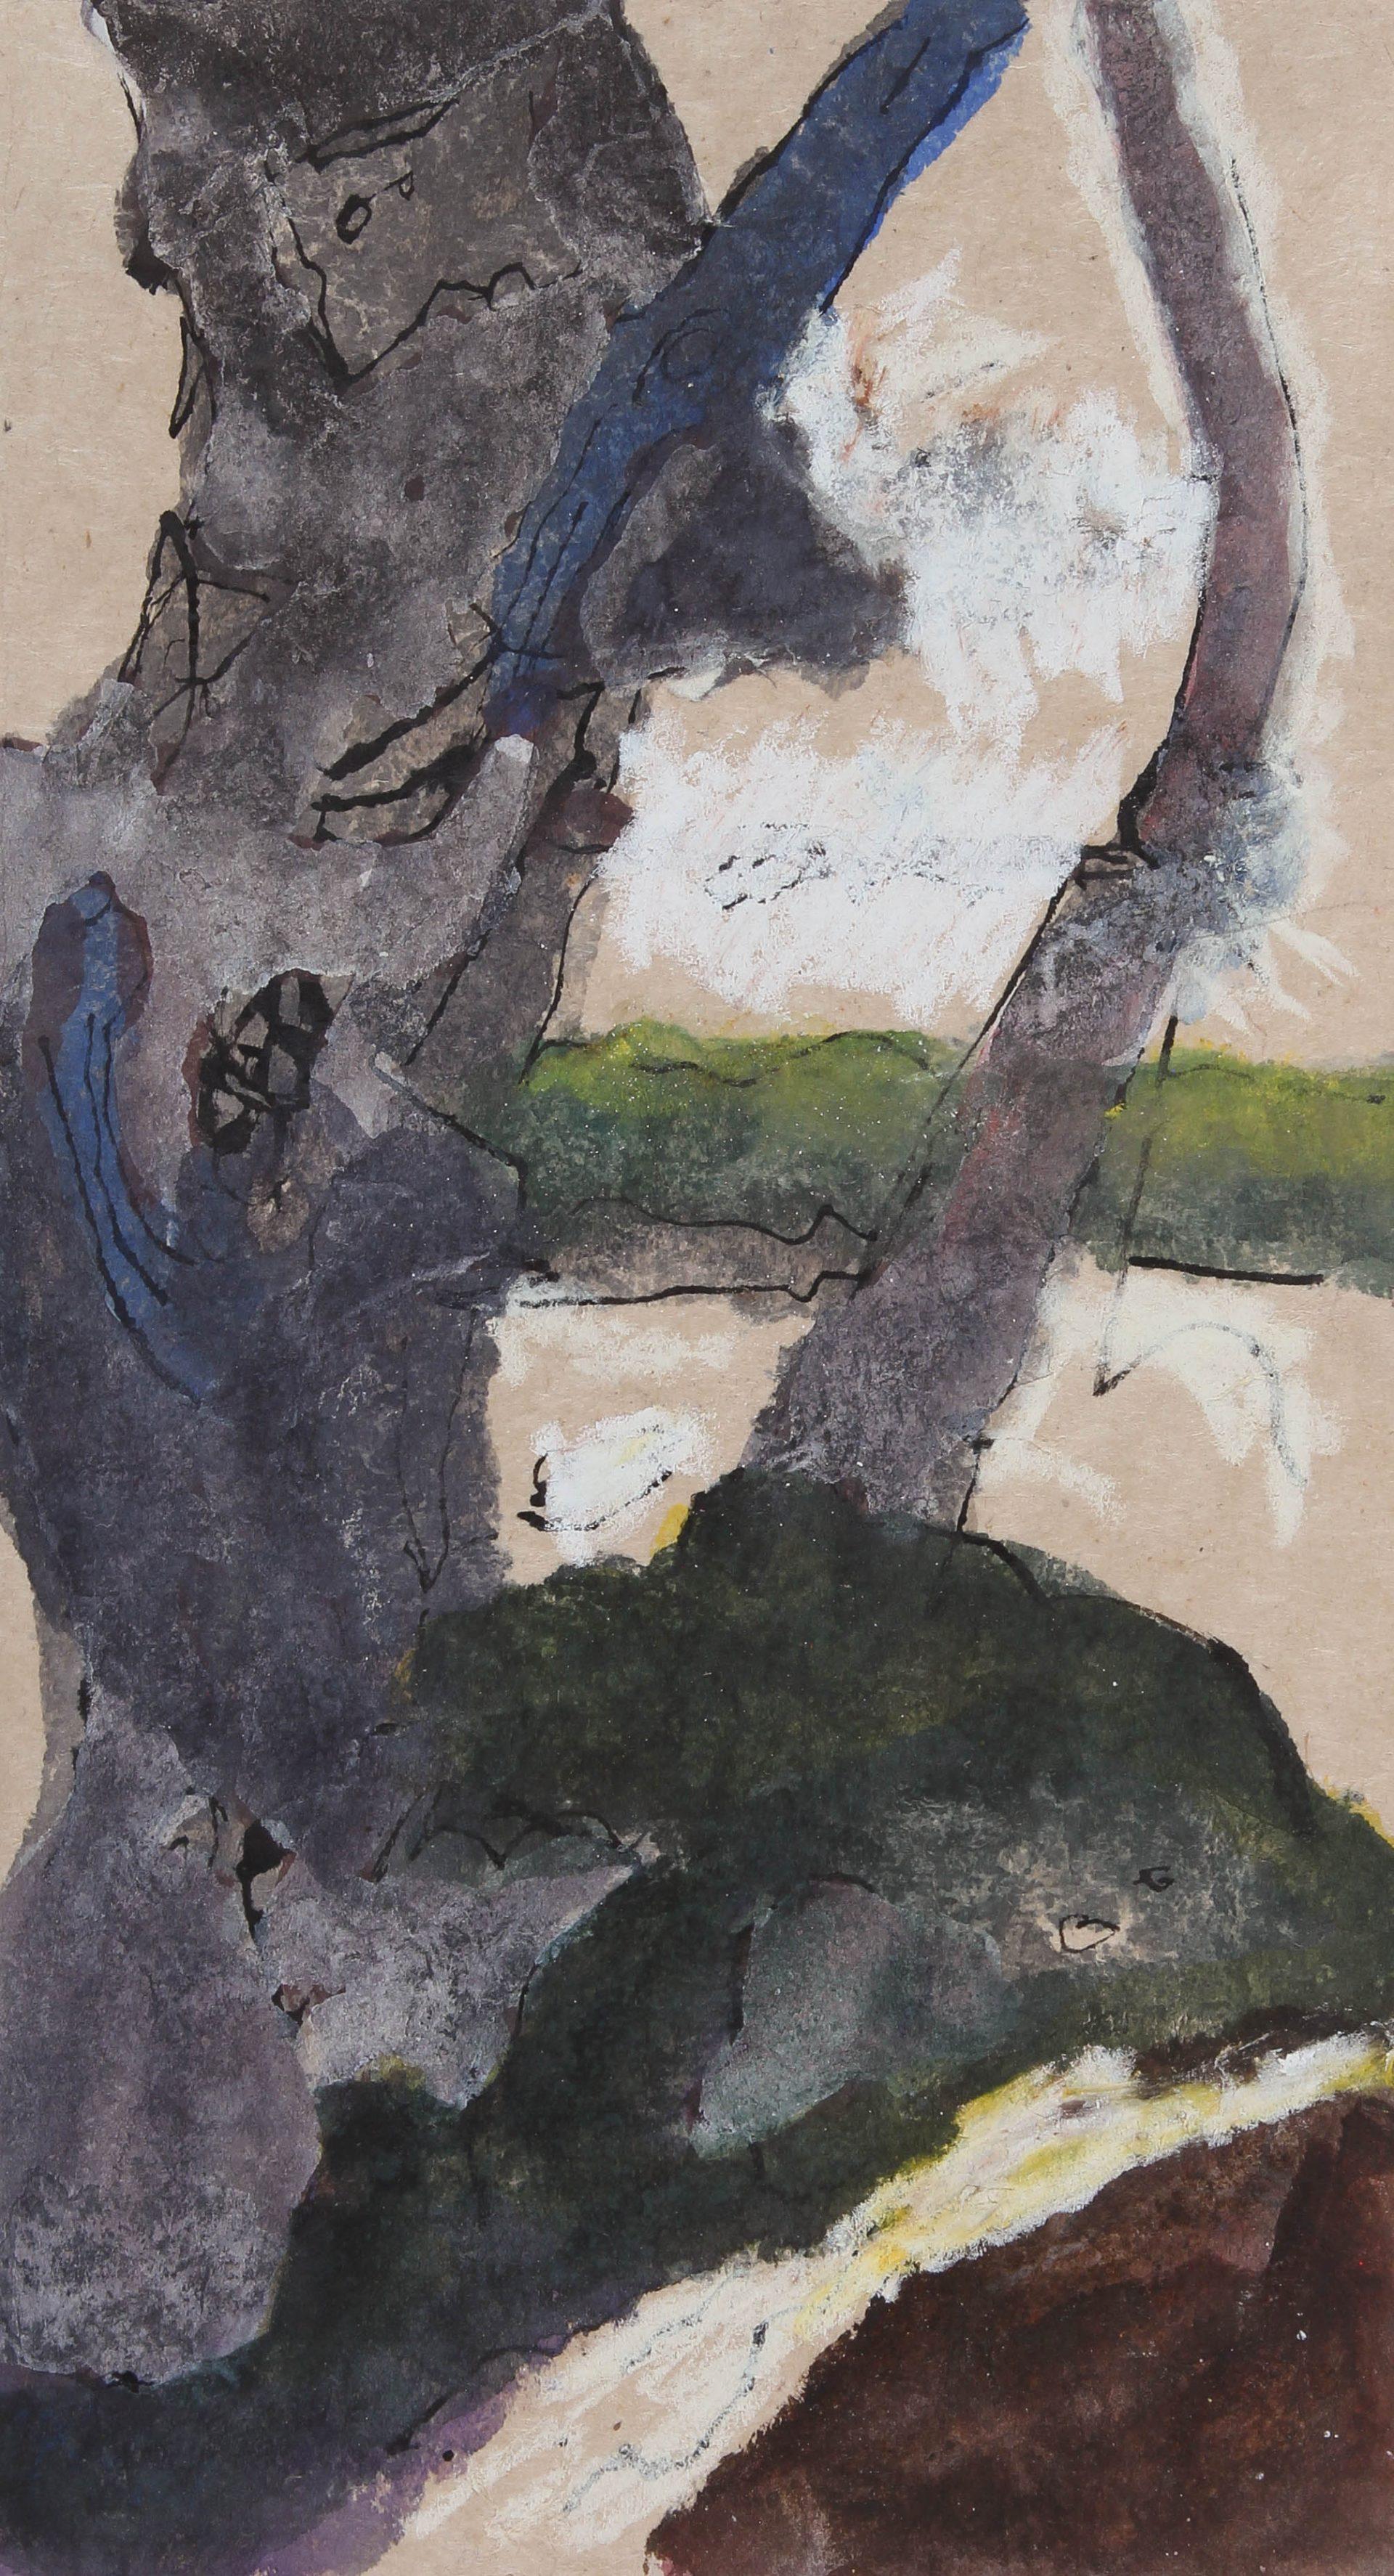 Peter Davey, artist - drawings